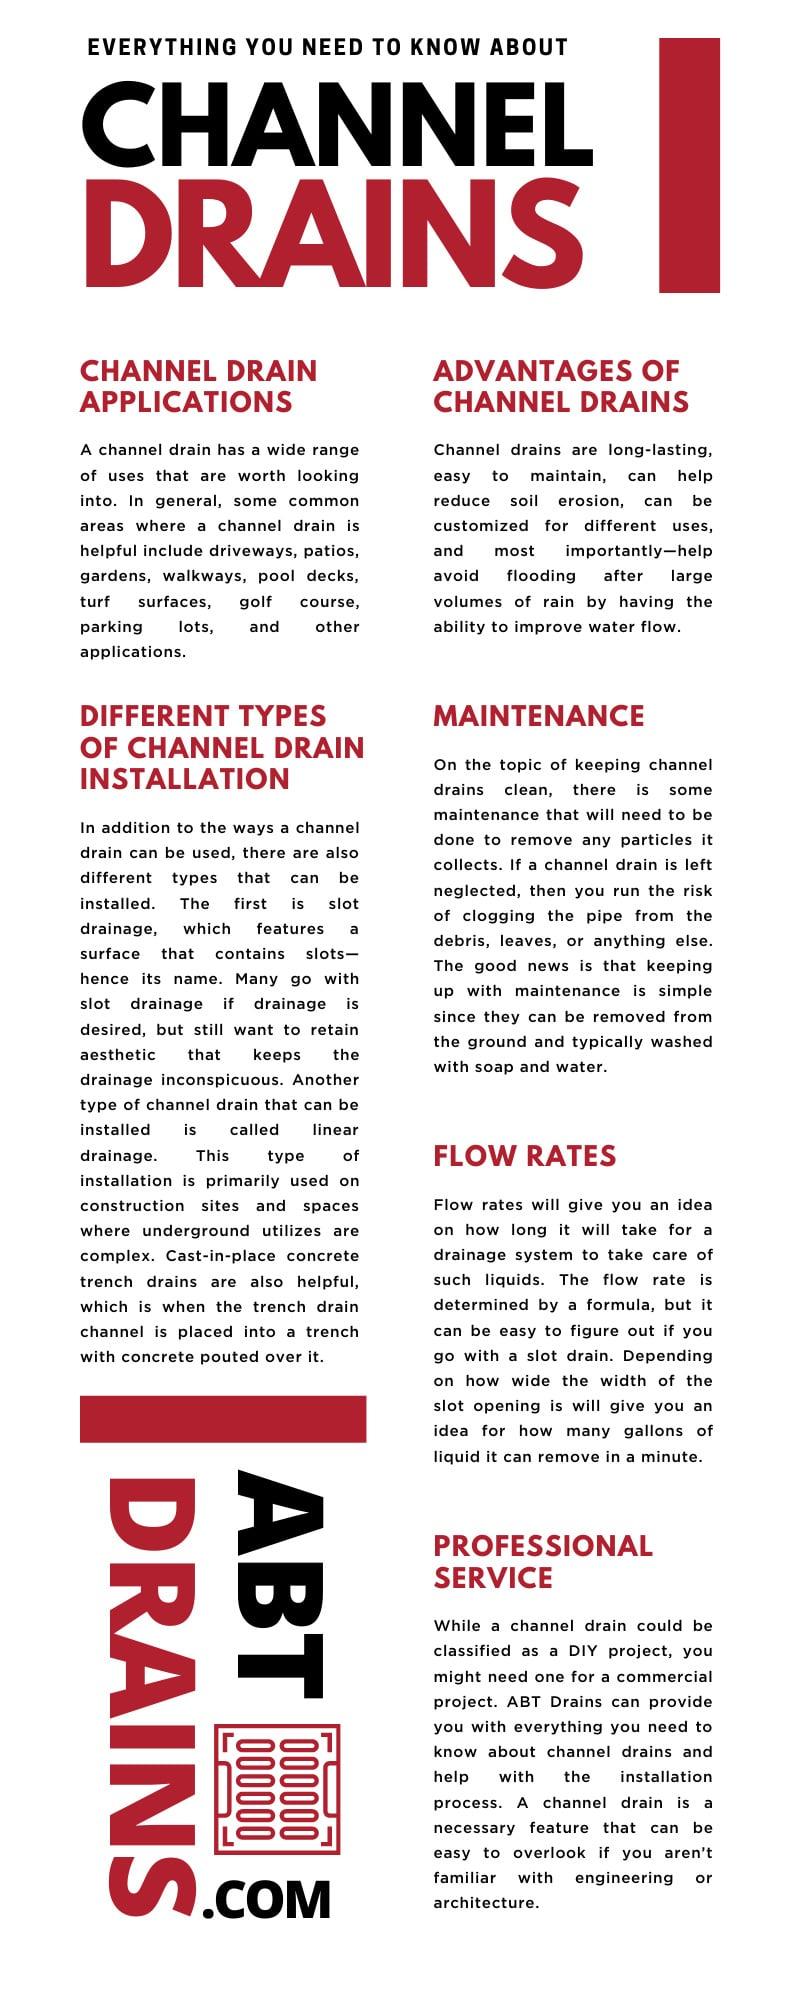 Channel Drains